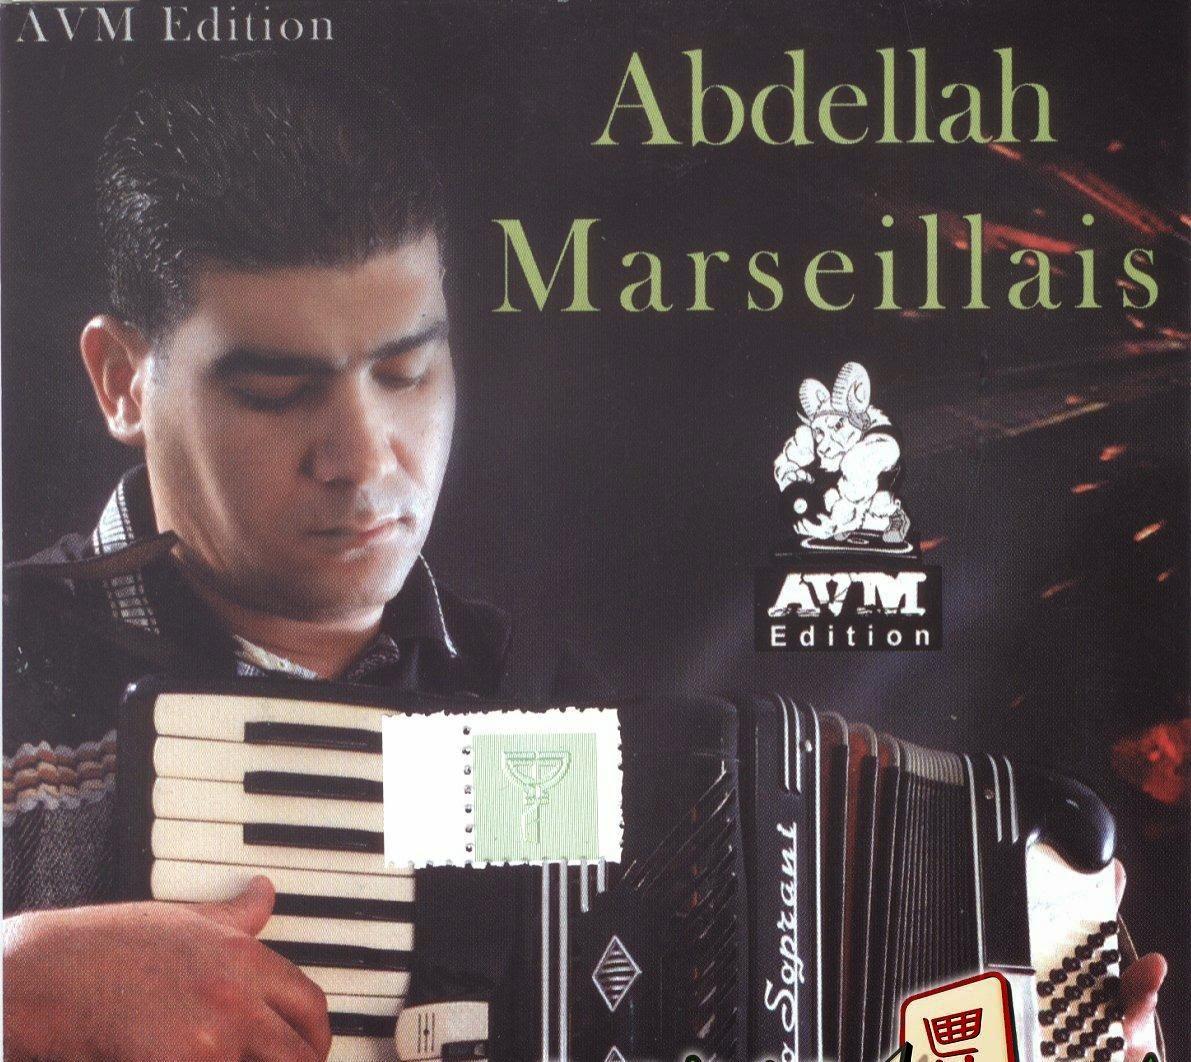 Abdellah Marseillais - Chkoun Eli biya 2014